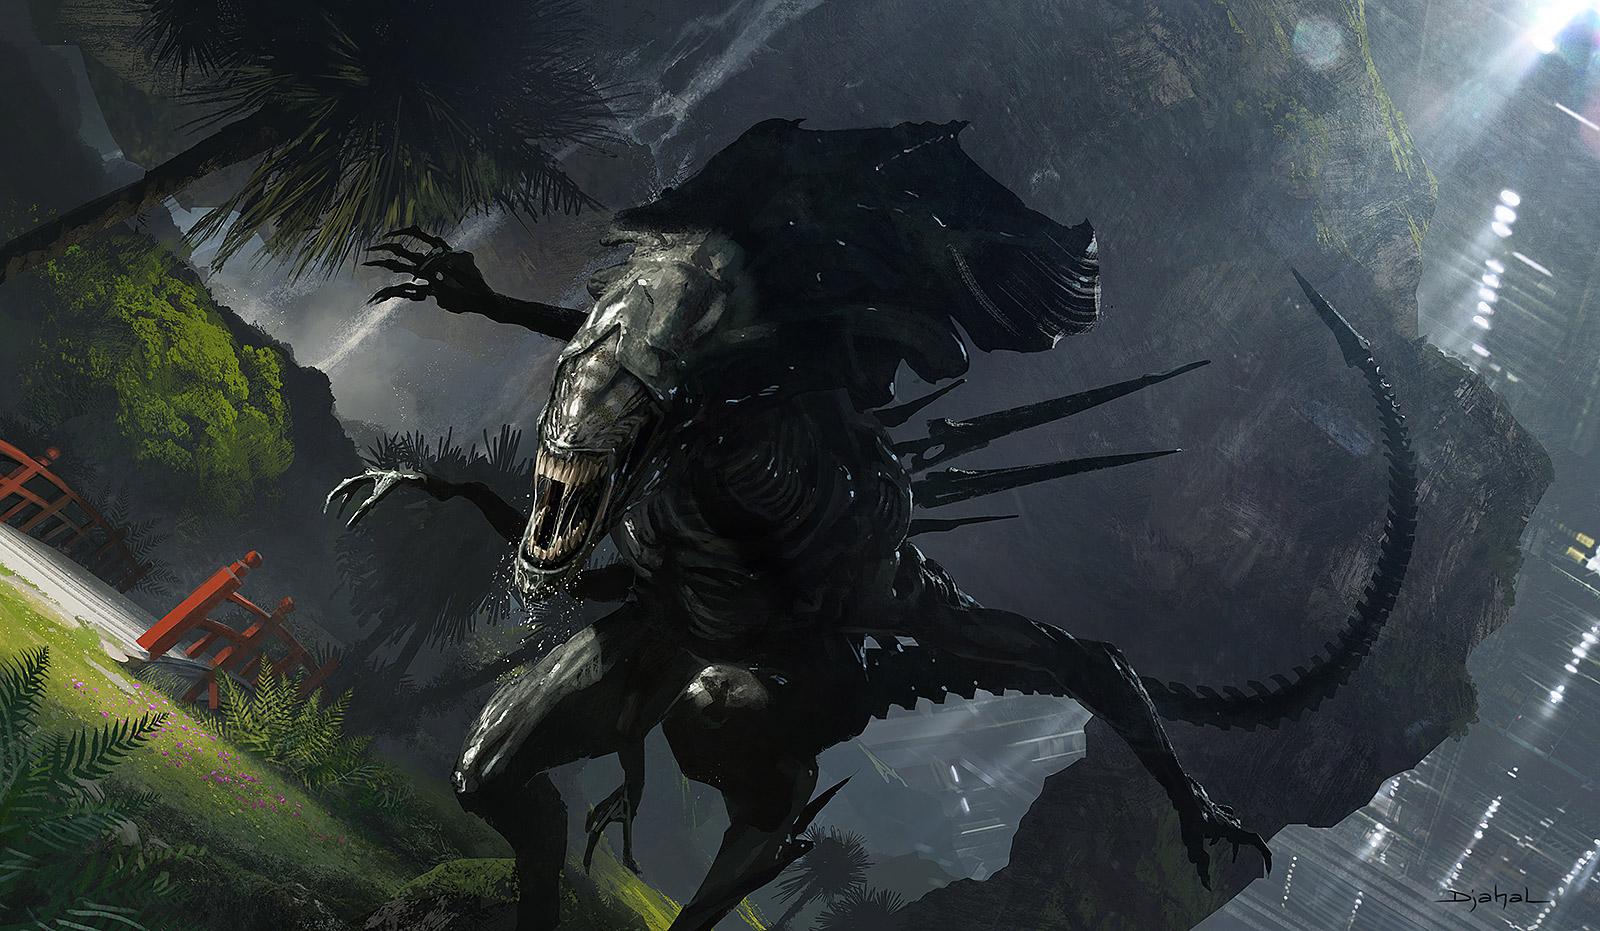 Neill Blomkamp Alien